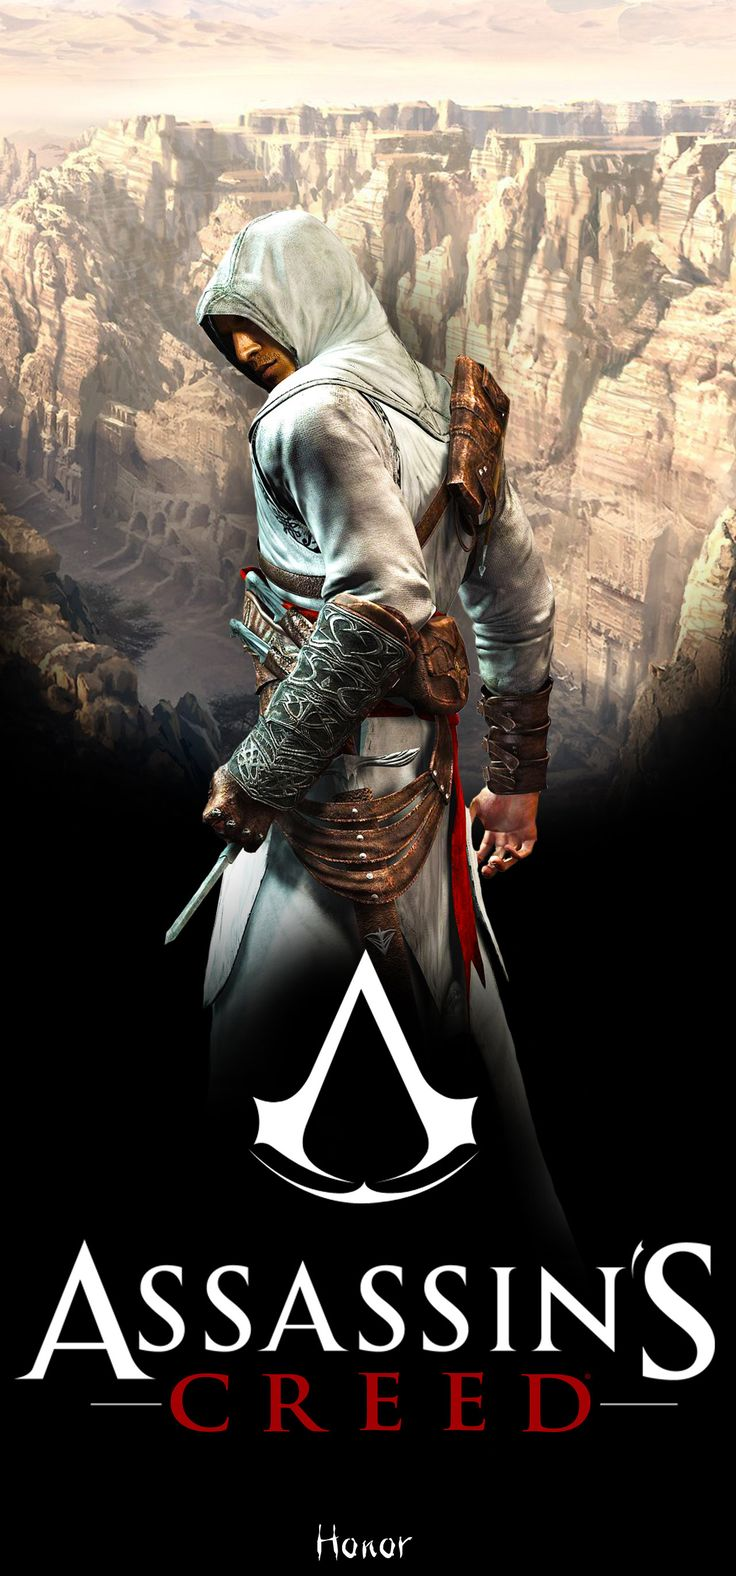 Assassin's Creed Poster (Large) - Altair by Ven93.deviantart.com on @deviantART